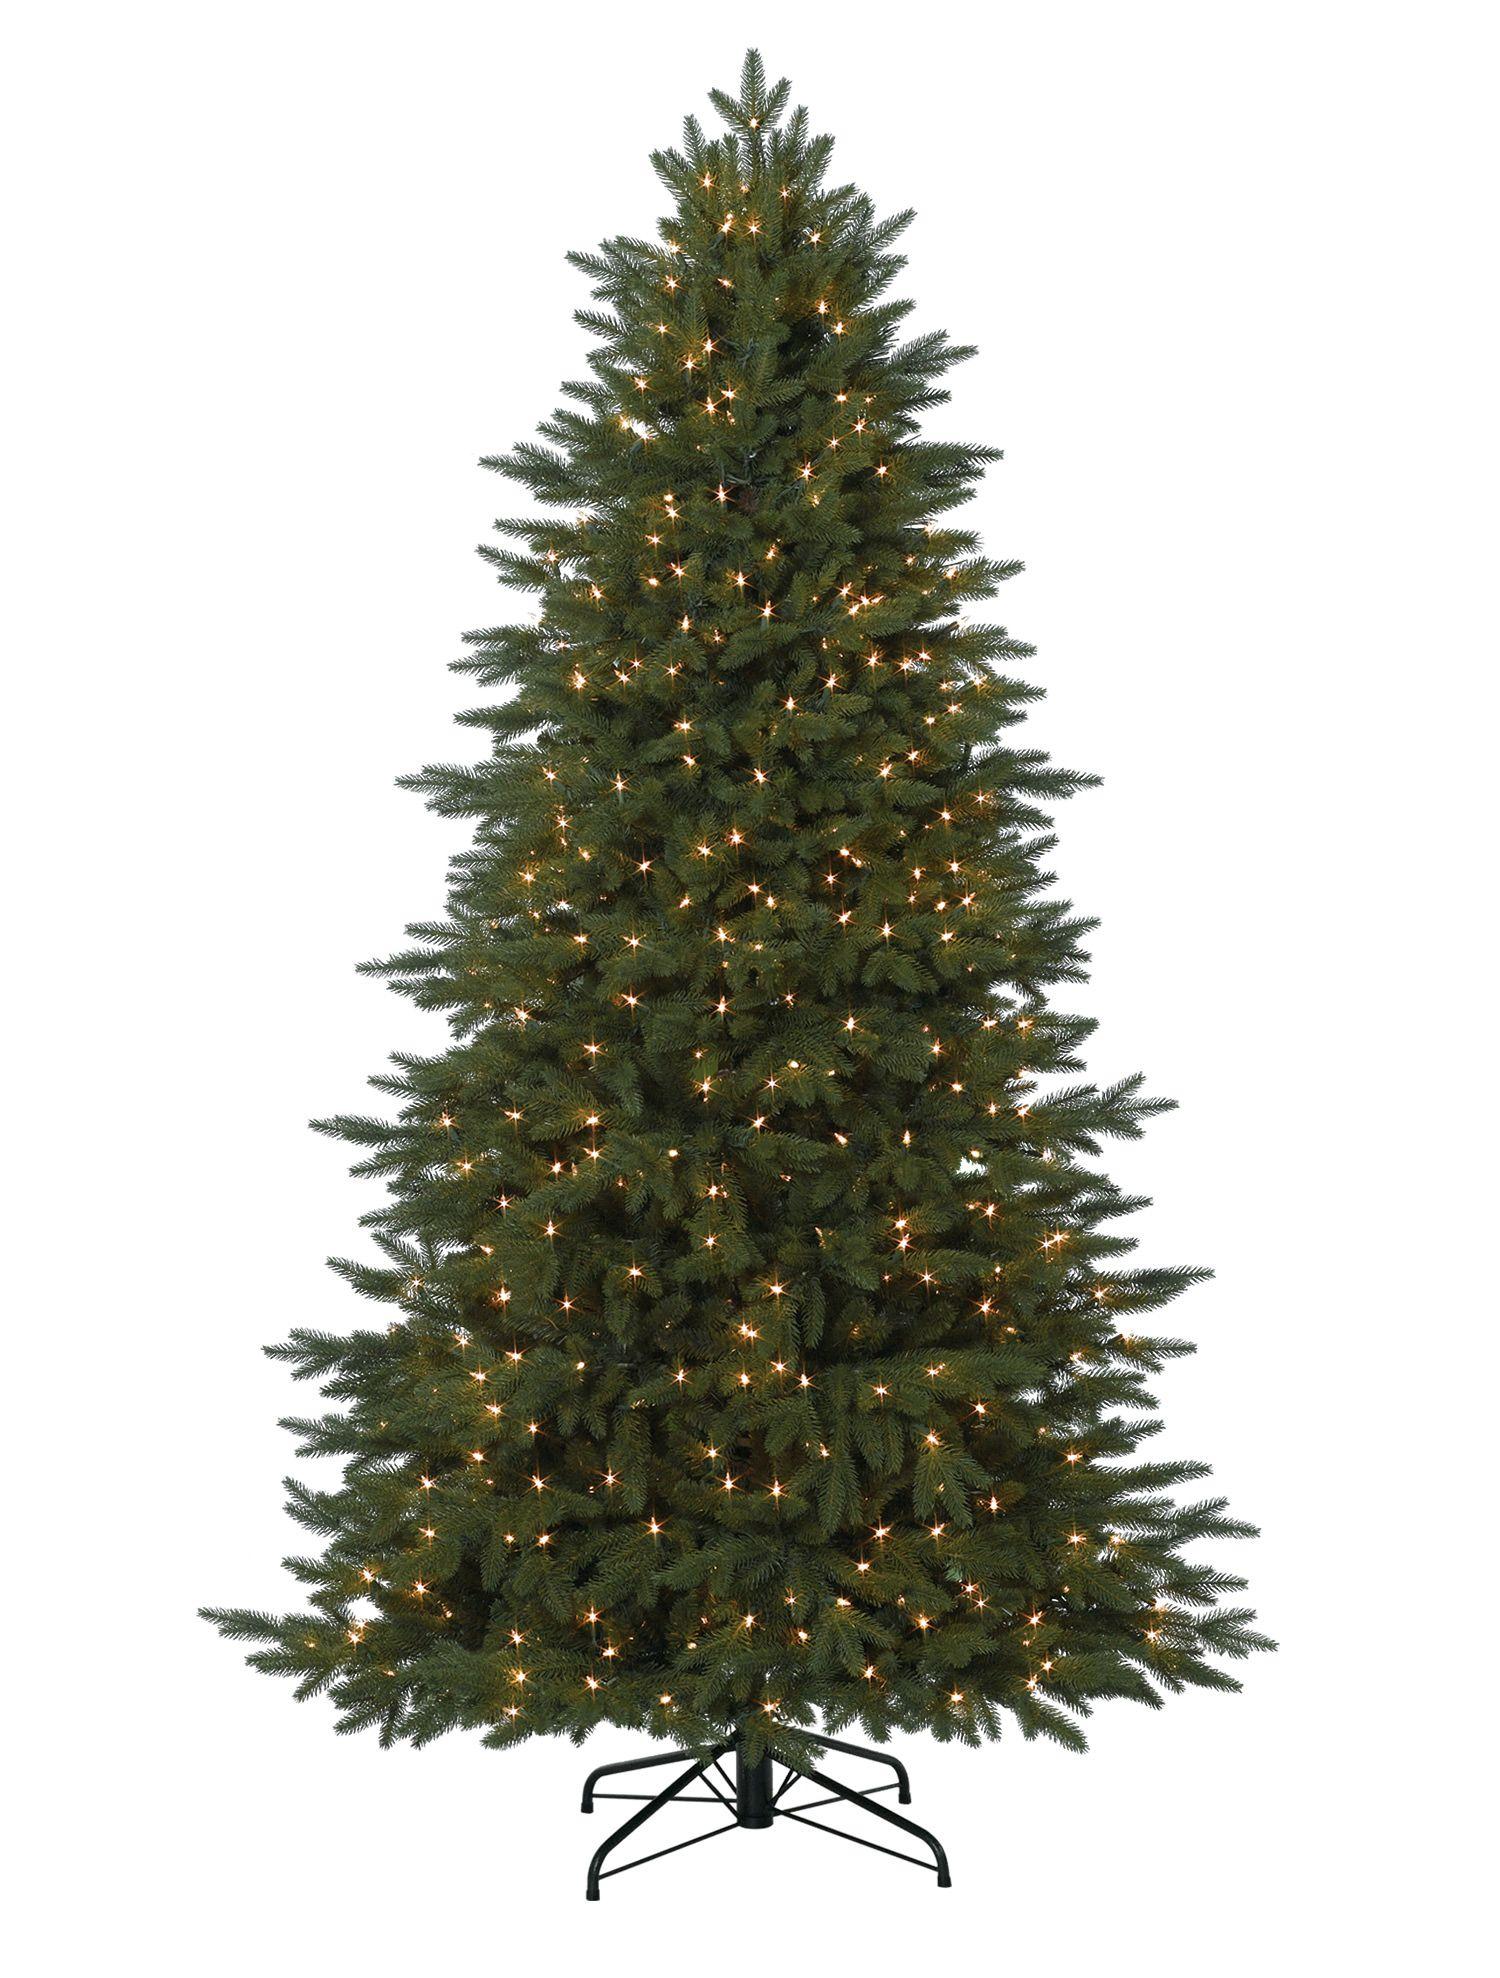 Buy Silverado Slim Christmas Trees Online - Balsam Hill (Sale